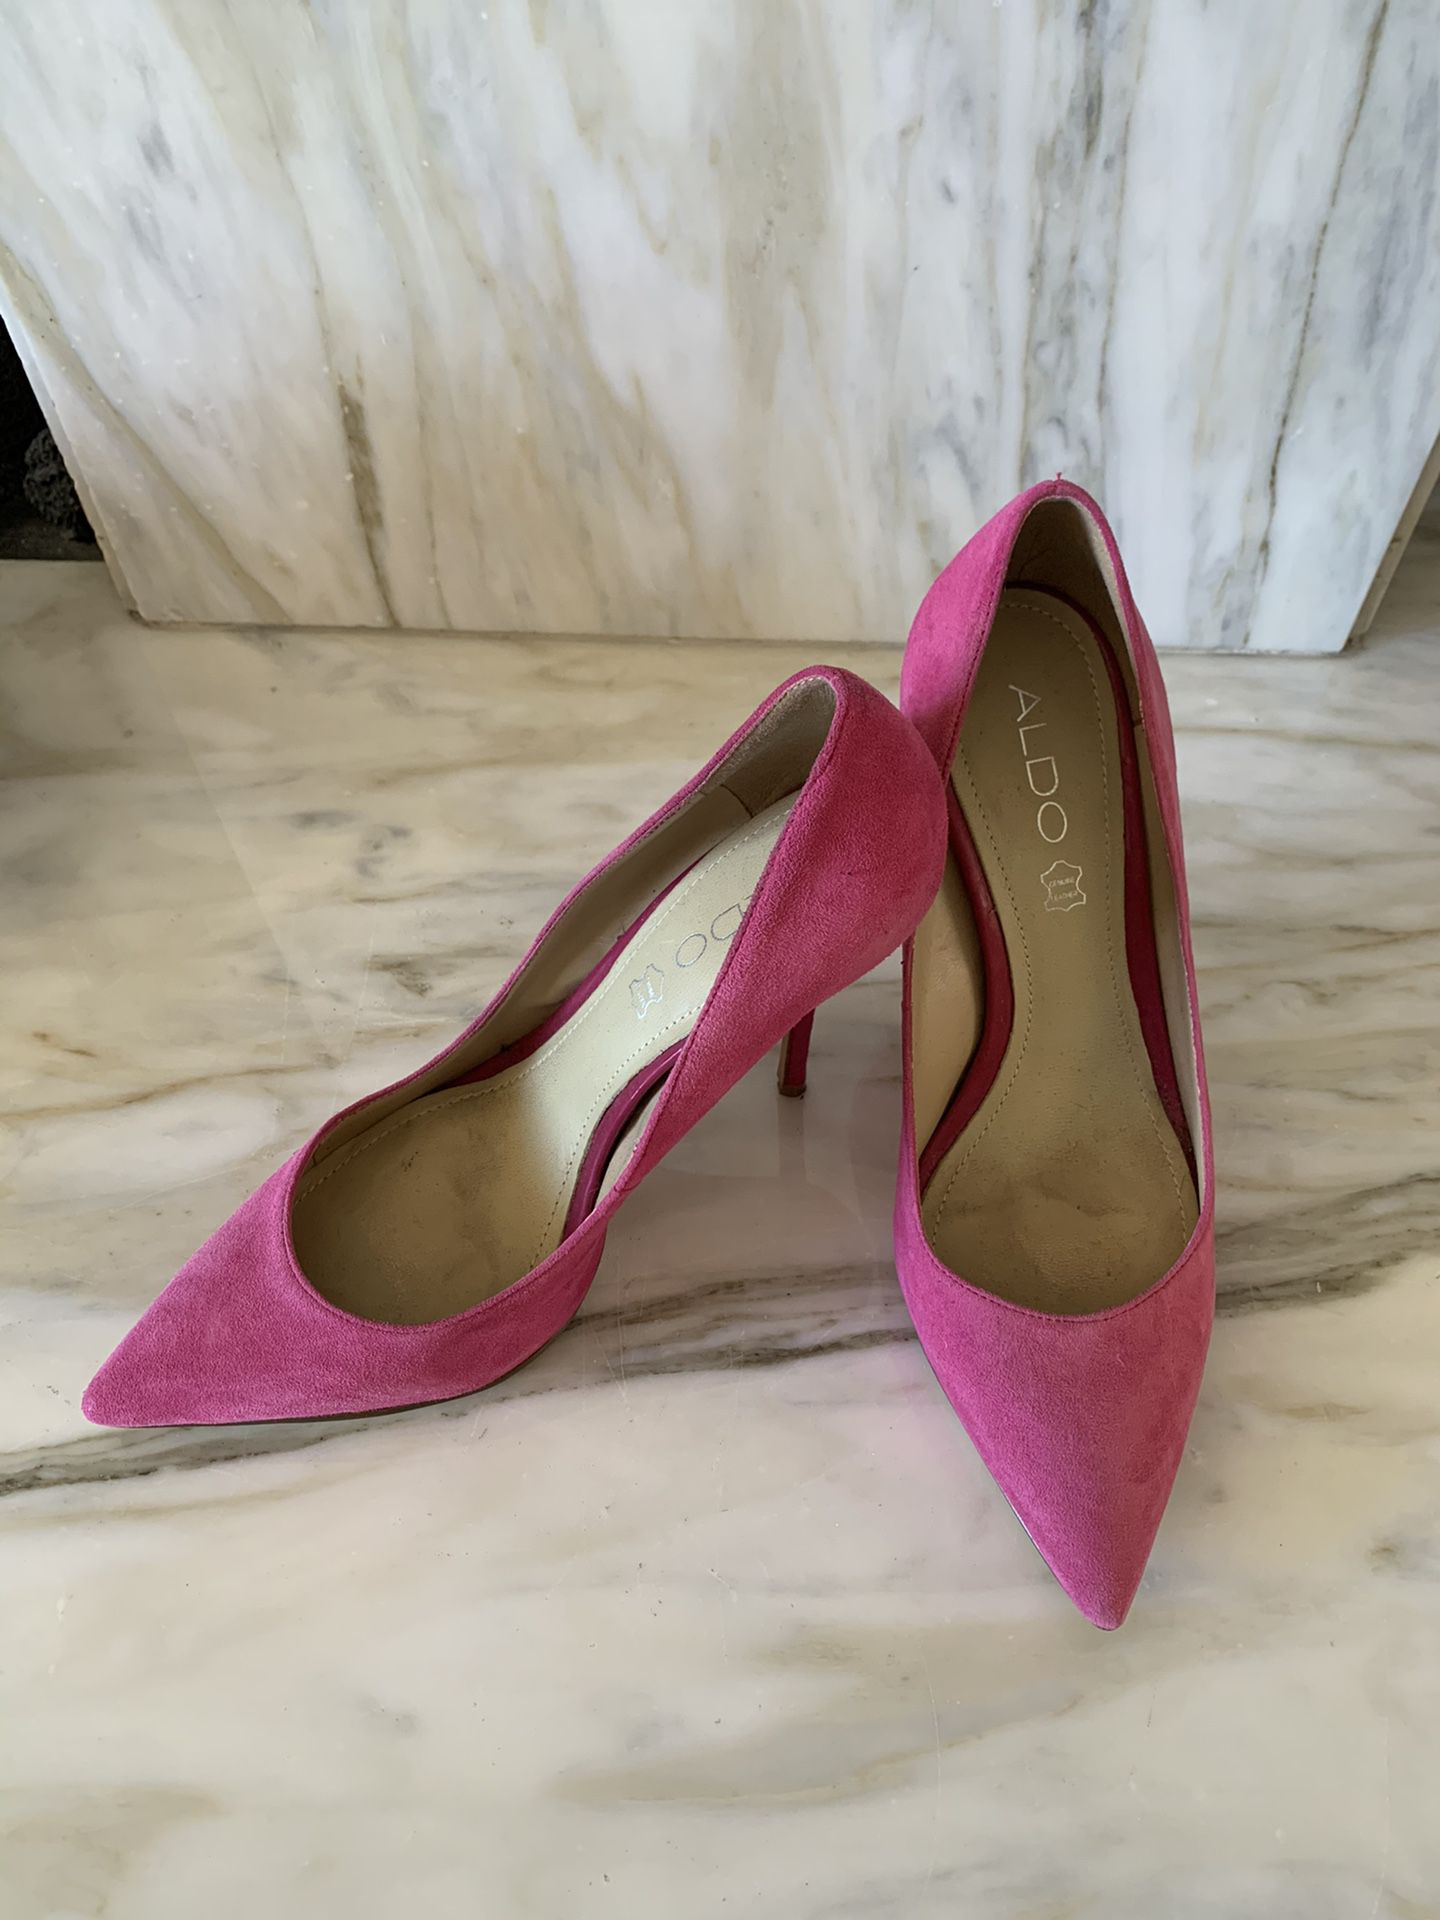 Aldo pumps magenta women's US size 6.5